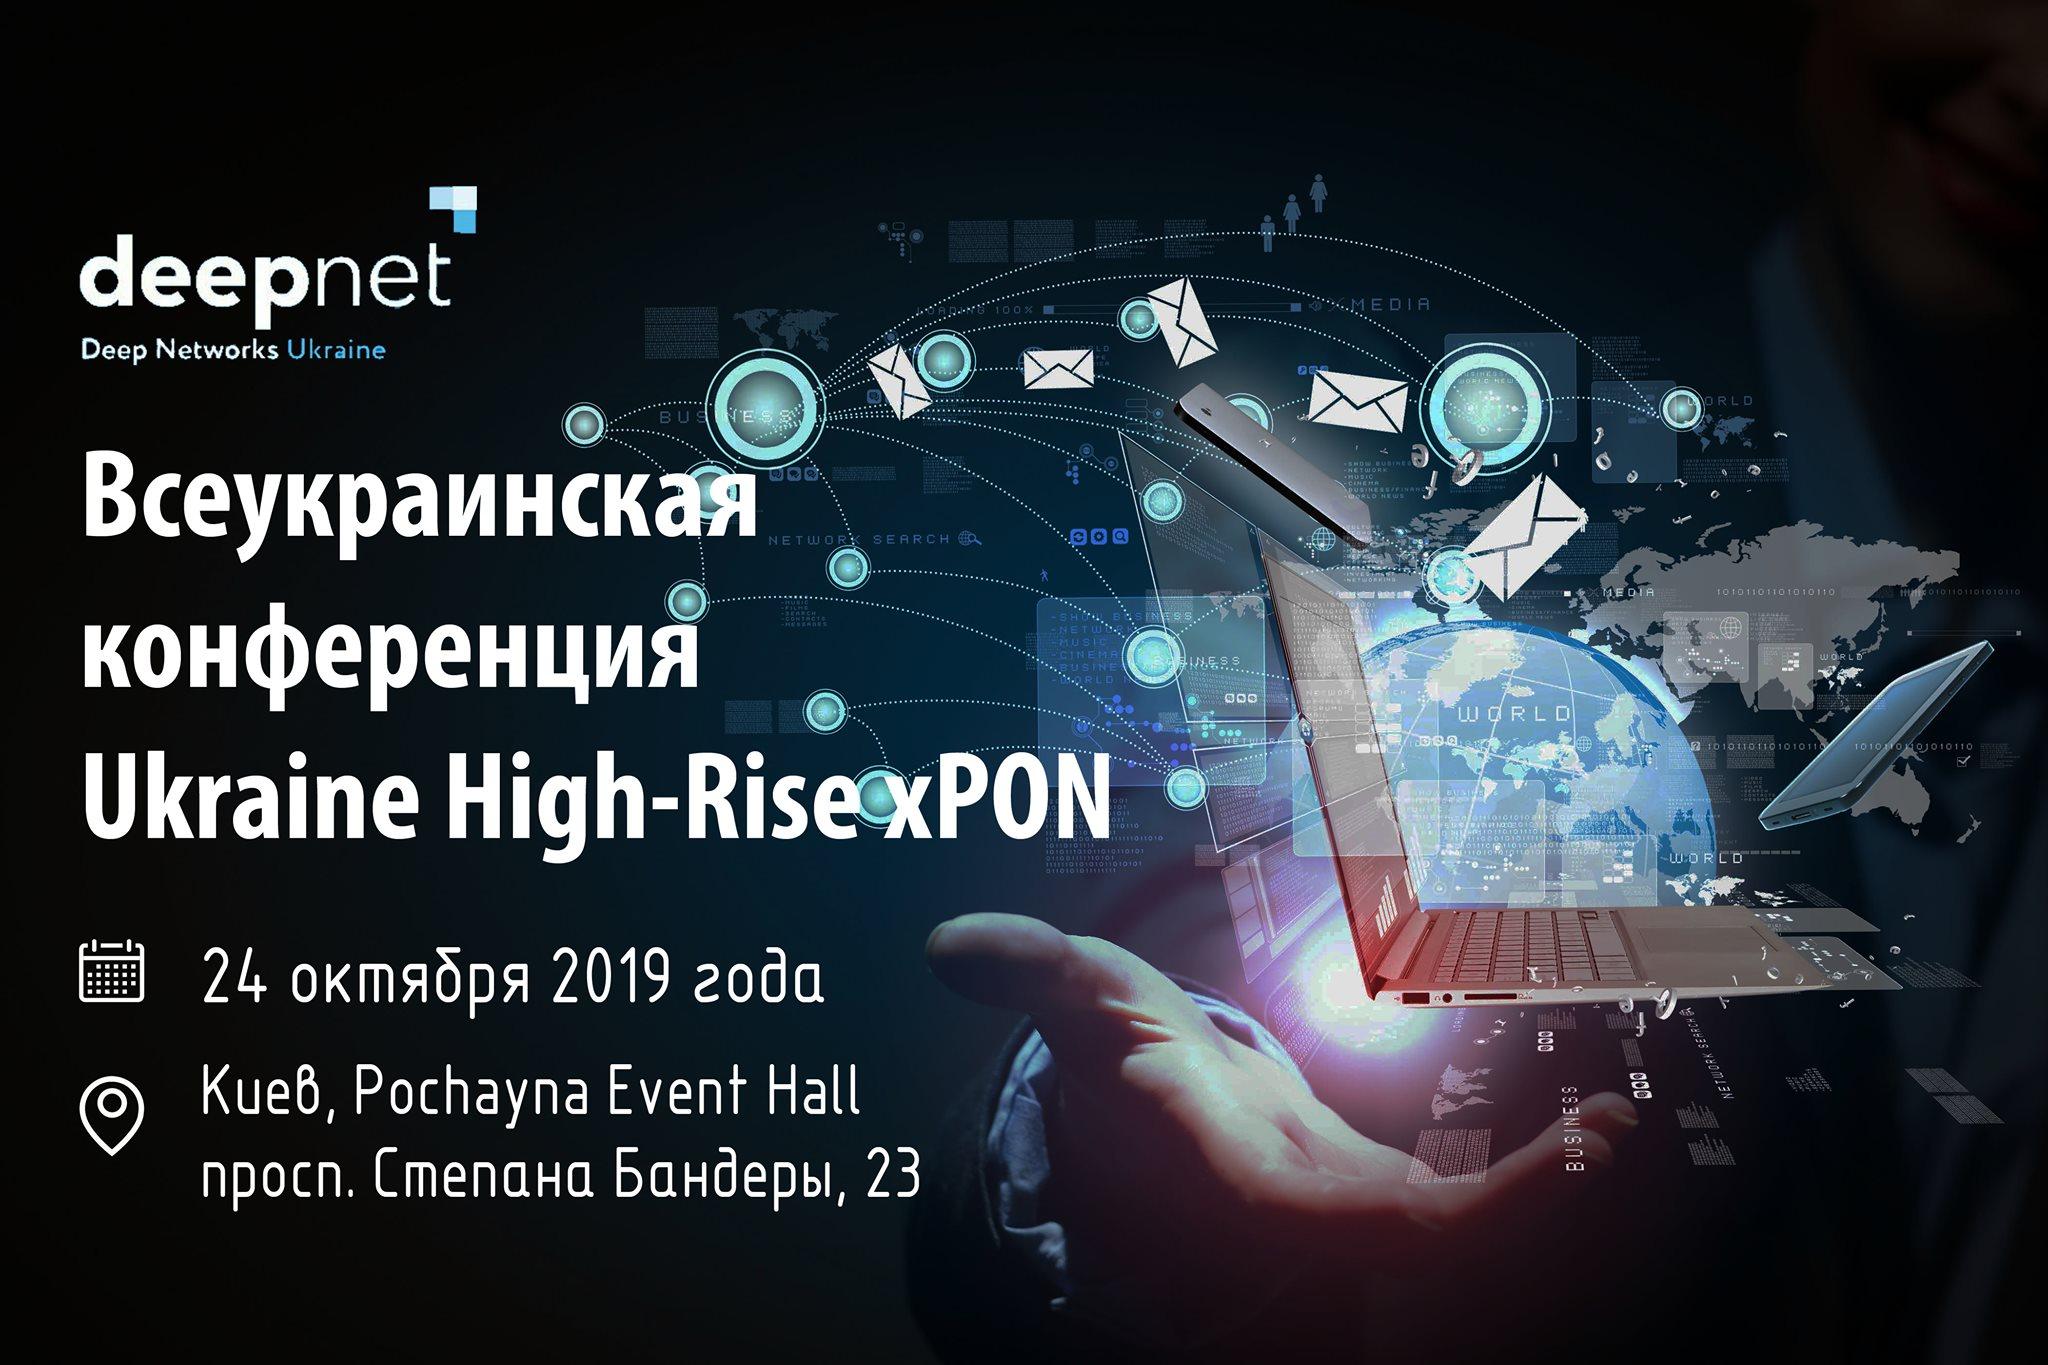 Ukraine High-Rise xPON